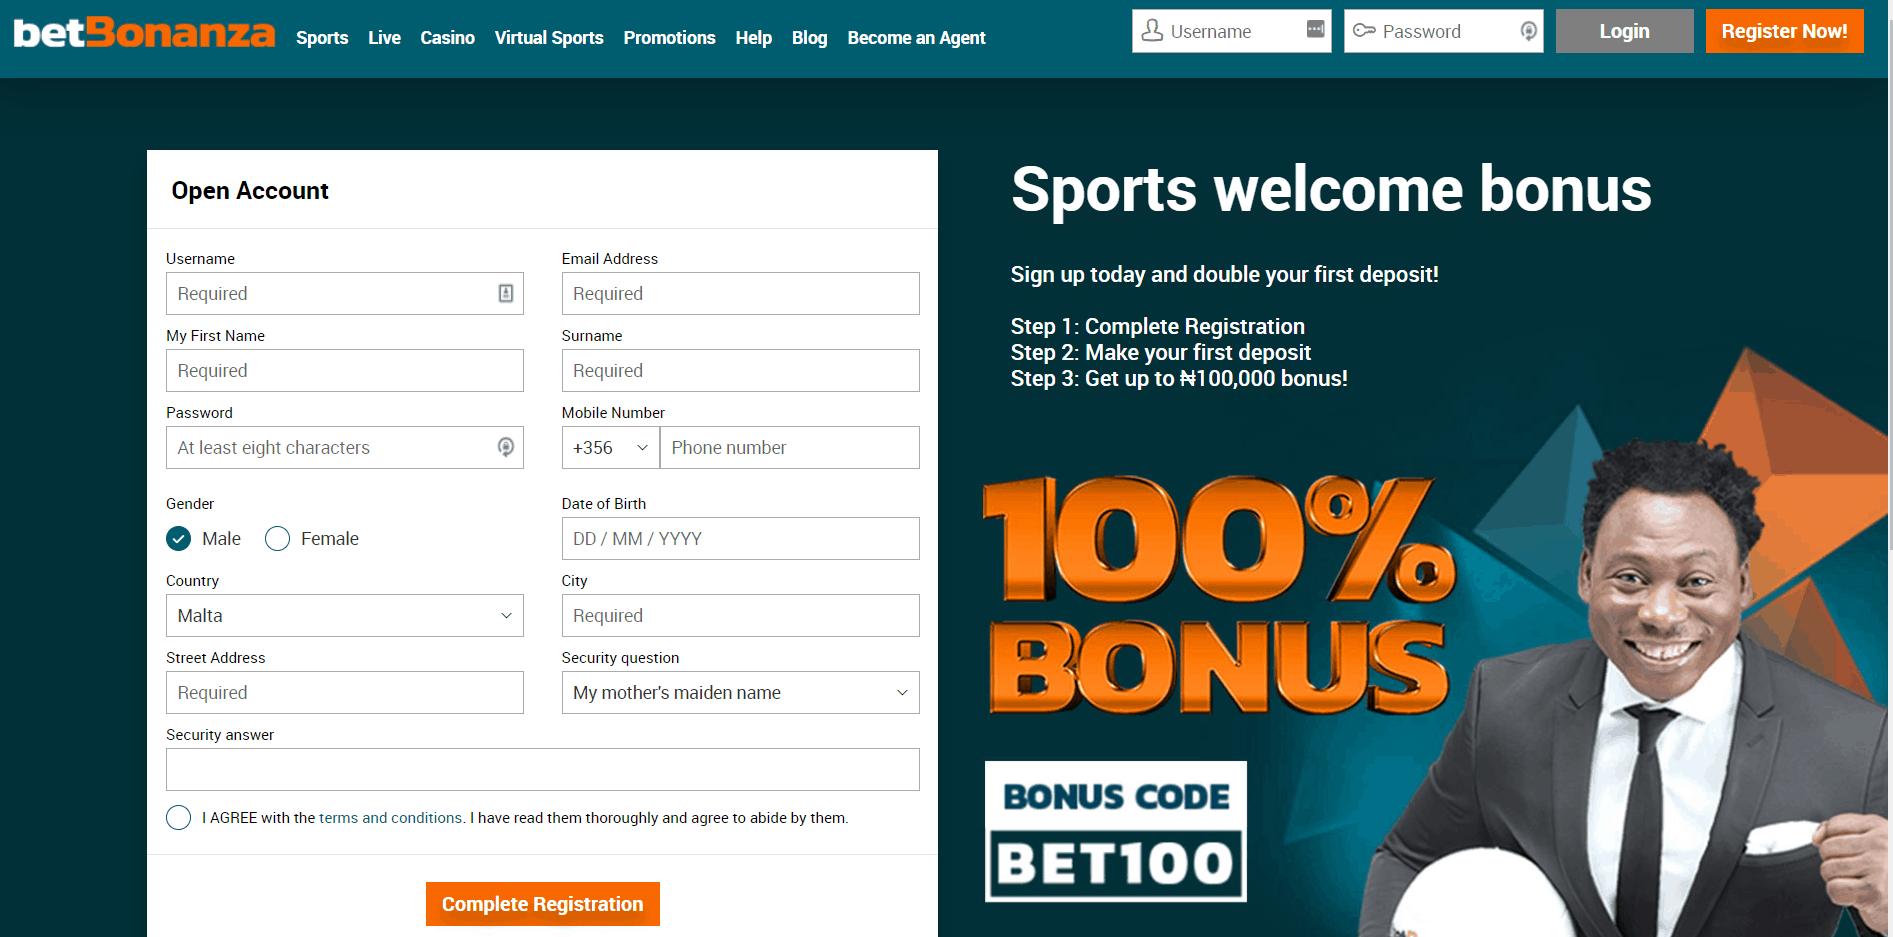 betbonanza registration page